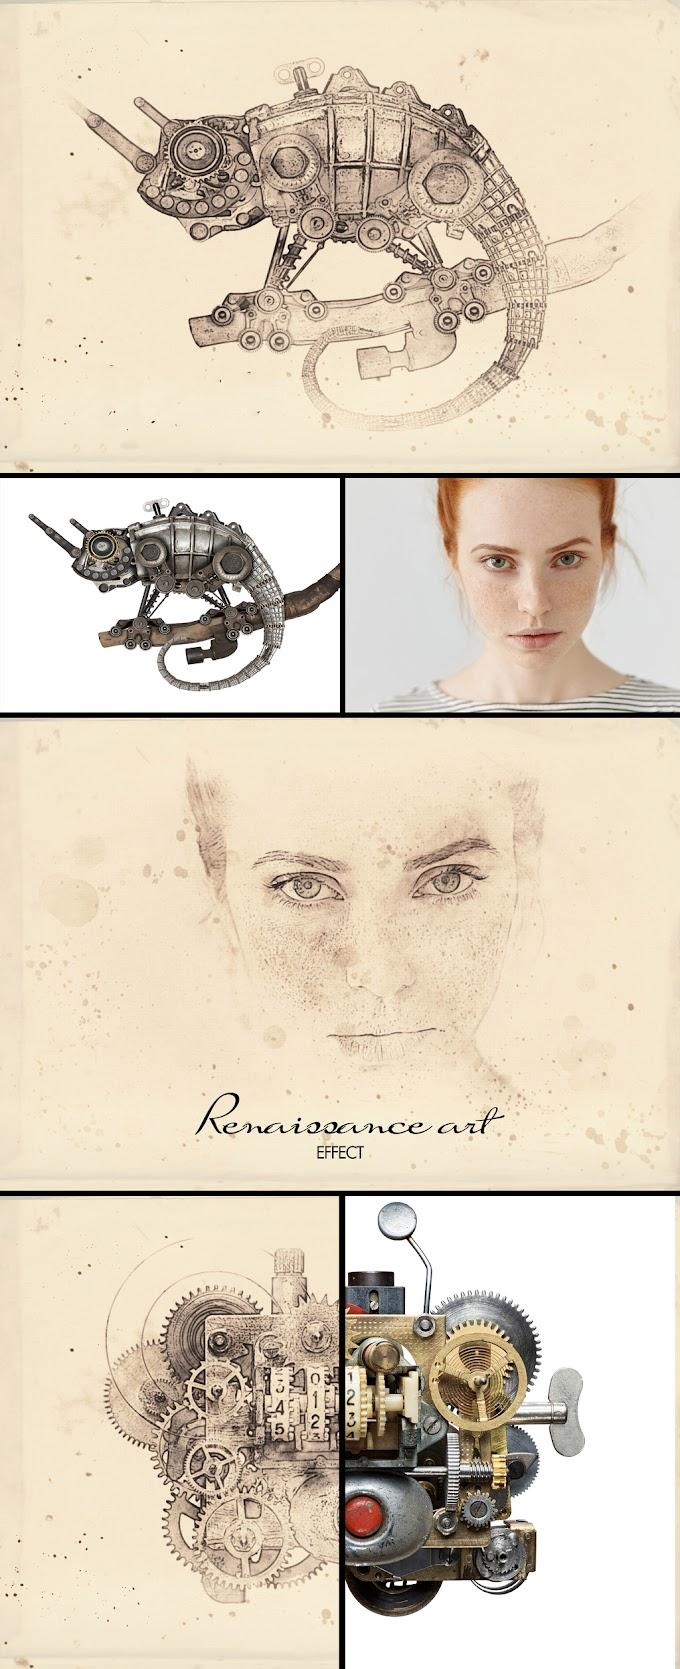 Renaissance Mixed Art Watercolor and Halftone Effect Mockup[Photoshop][387459948]